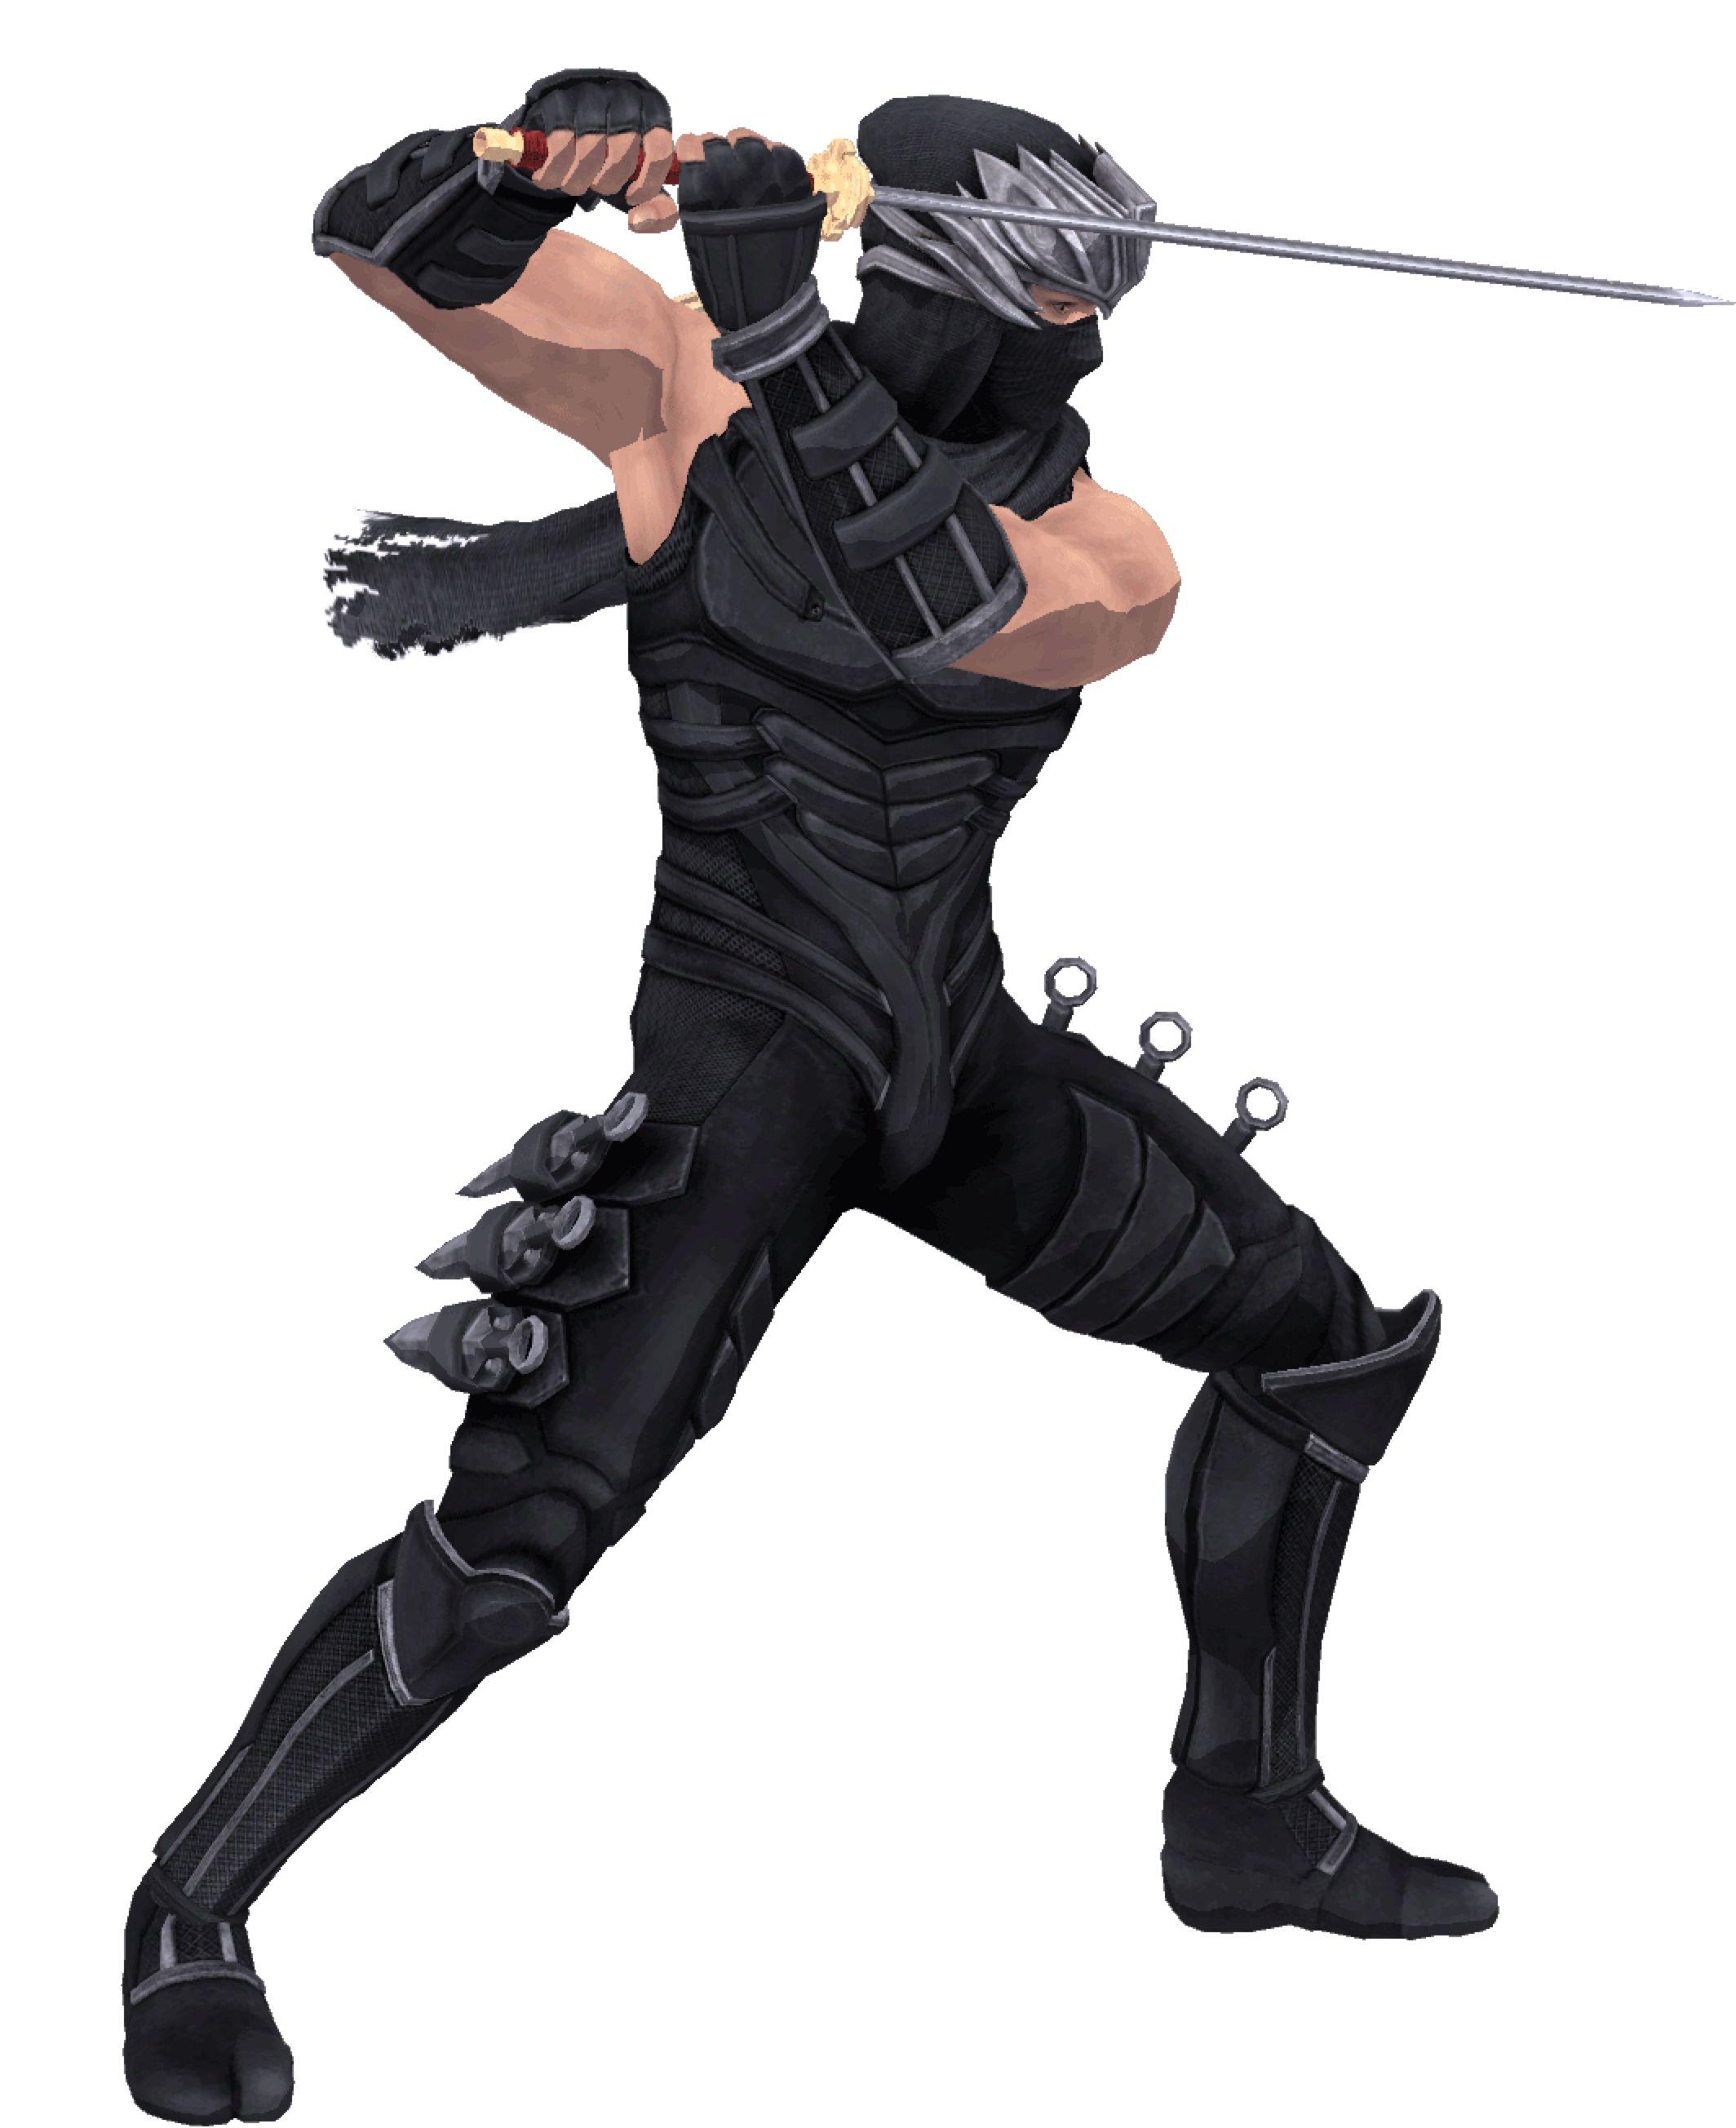 Ryu Hayabusa Standing Stance 2d By Larsmasters On Deviantart